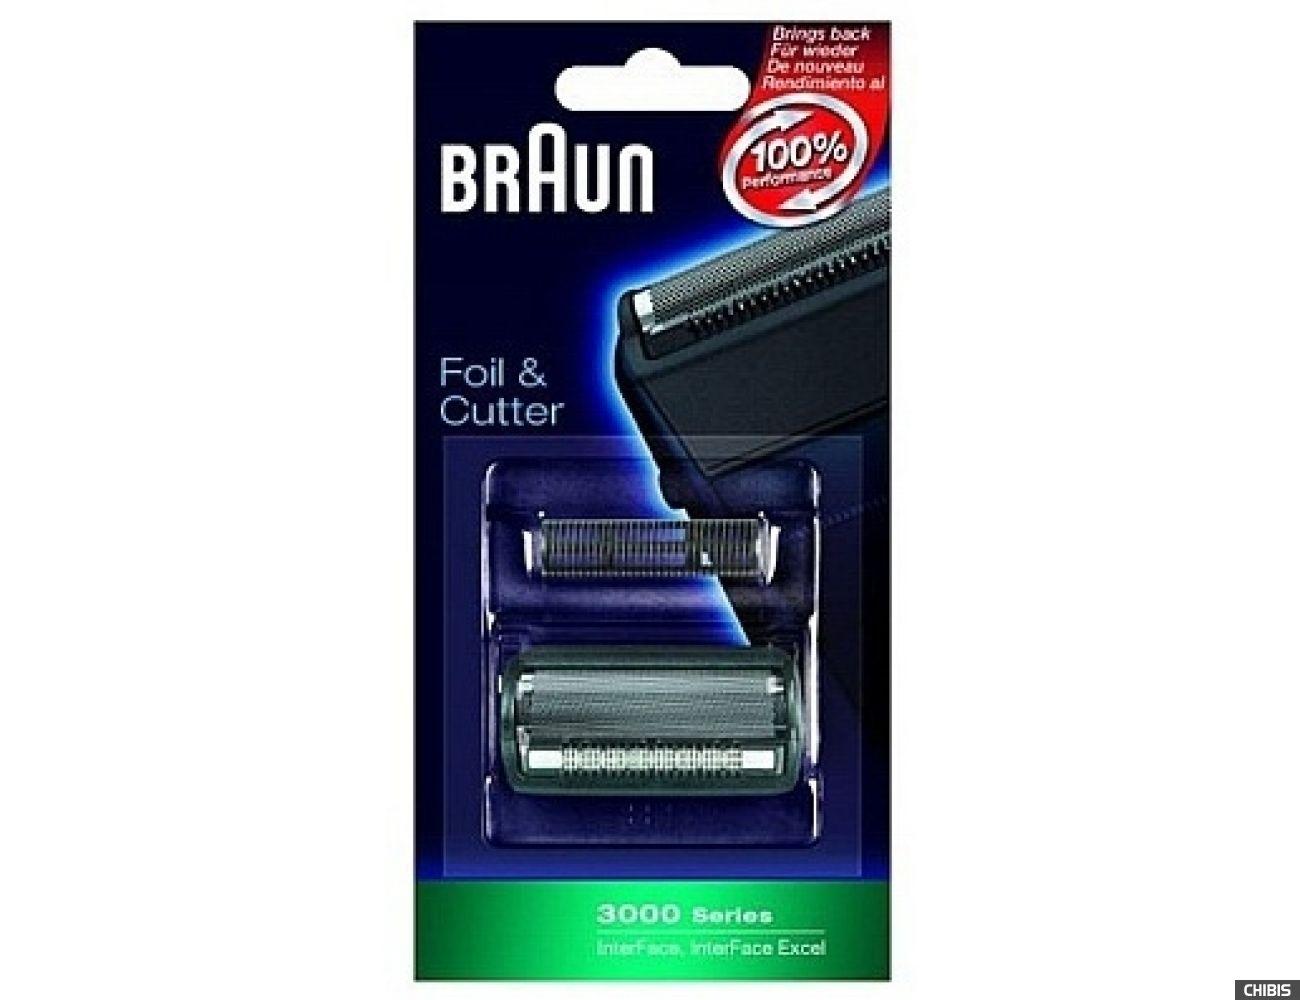 Сетка и режущий блок Braun 3000 Interface/Interface Excel (5628763)